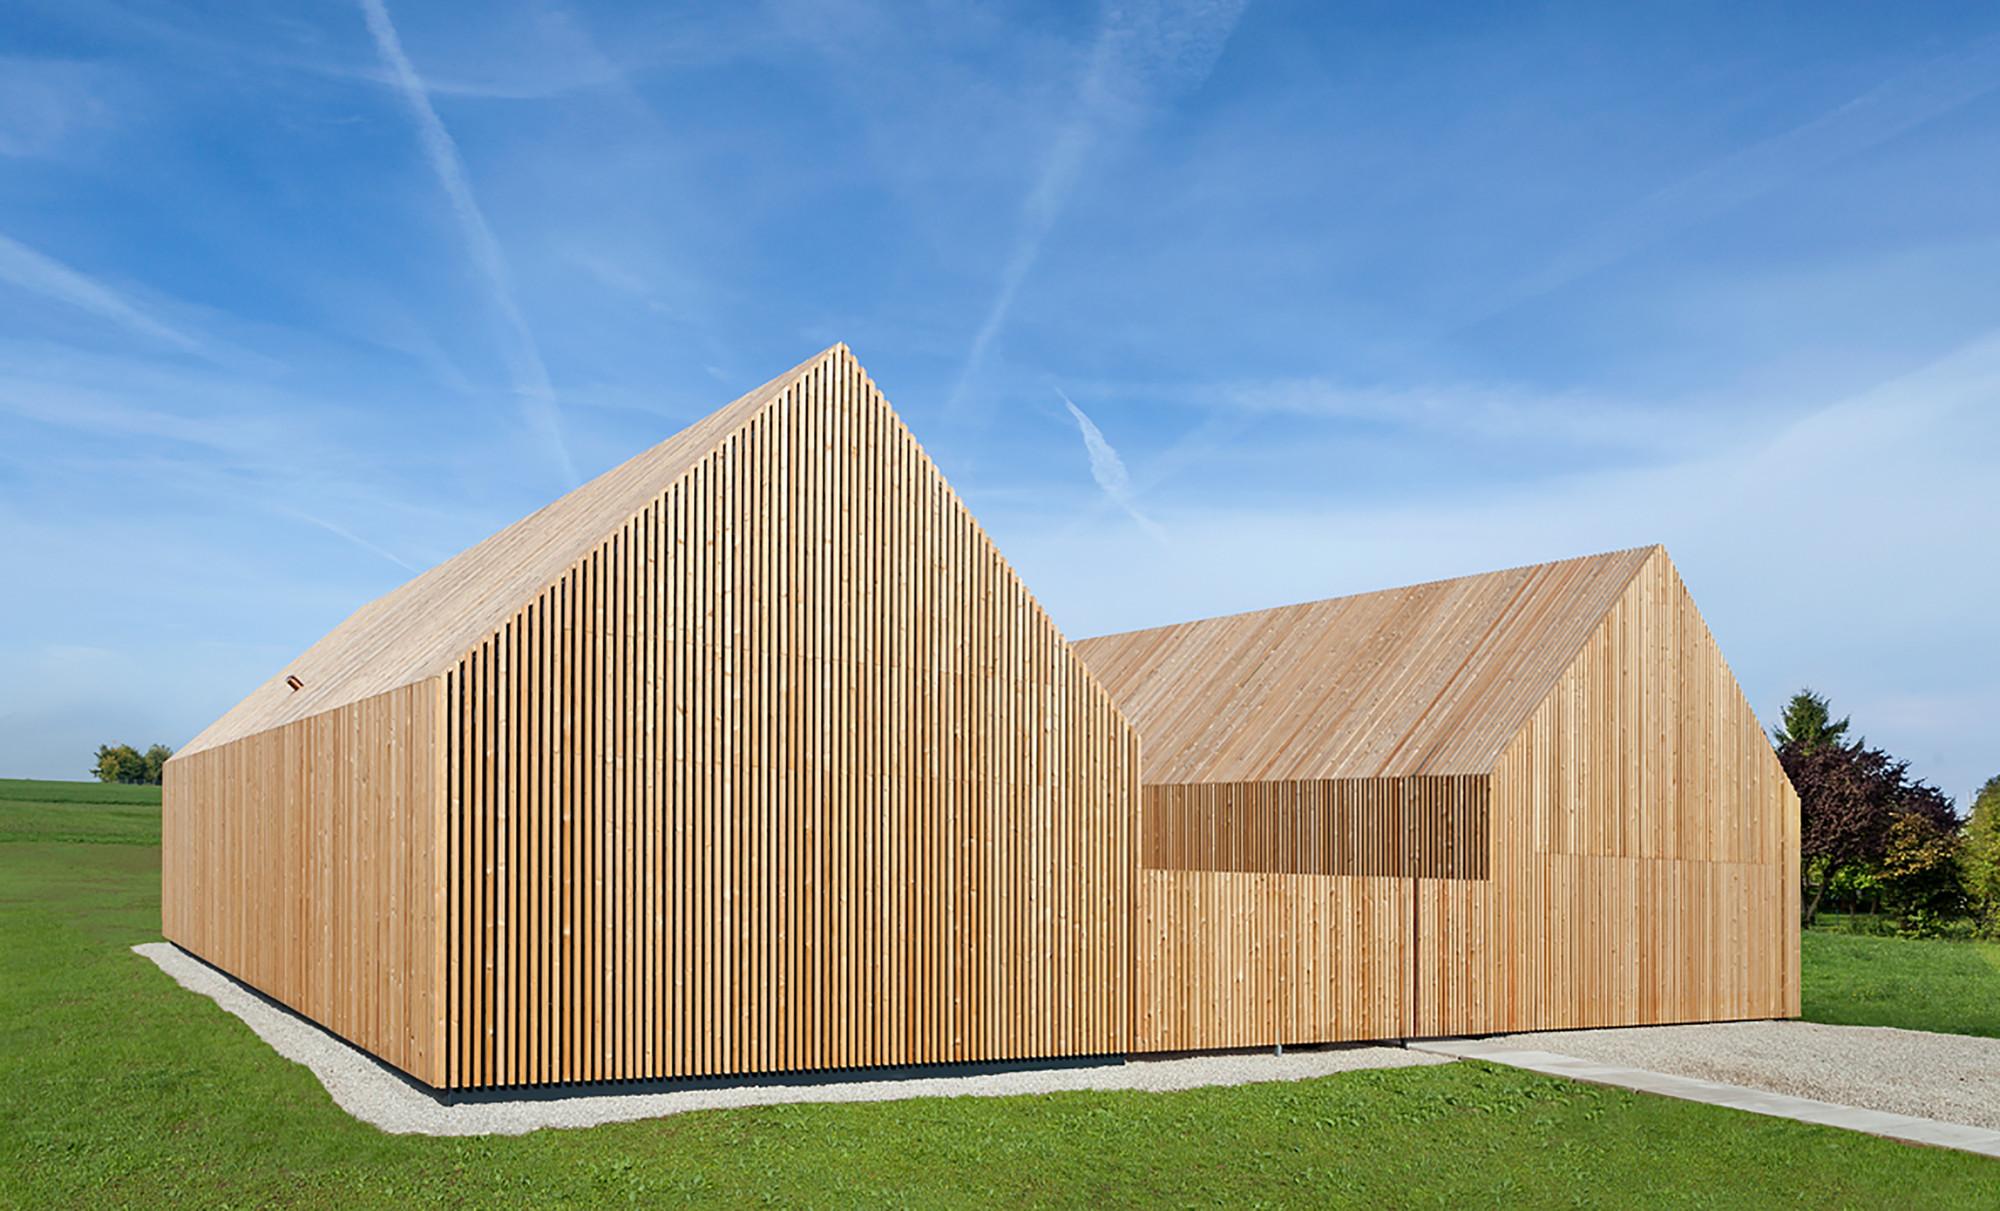 Timber House / KÜHNLEIN Architektur, Courtesy of KÜHNLEIN Architektur